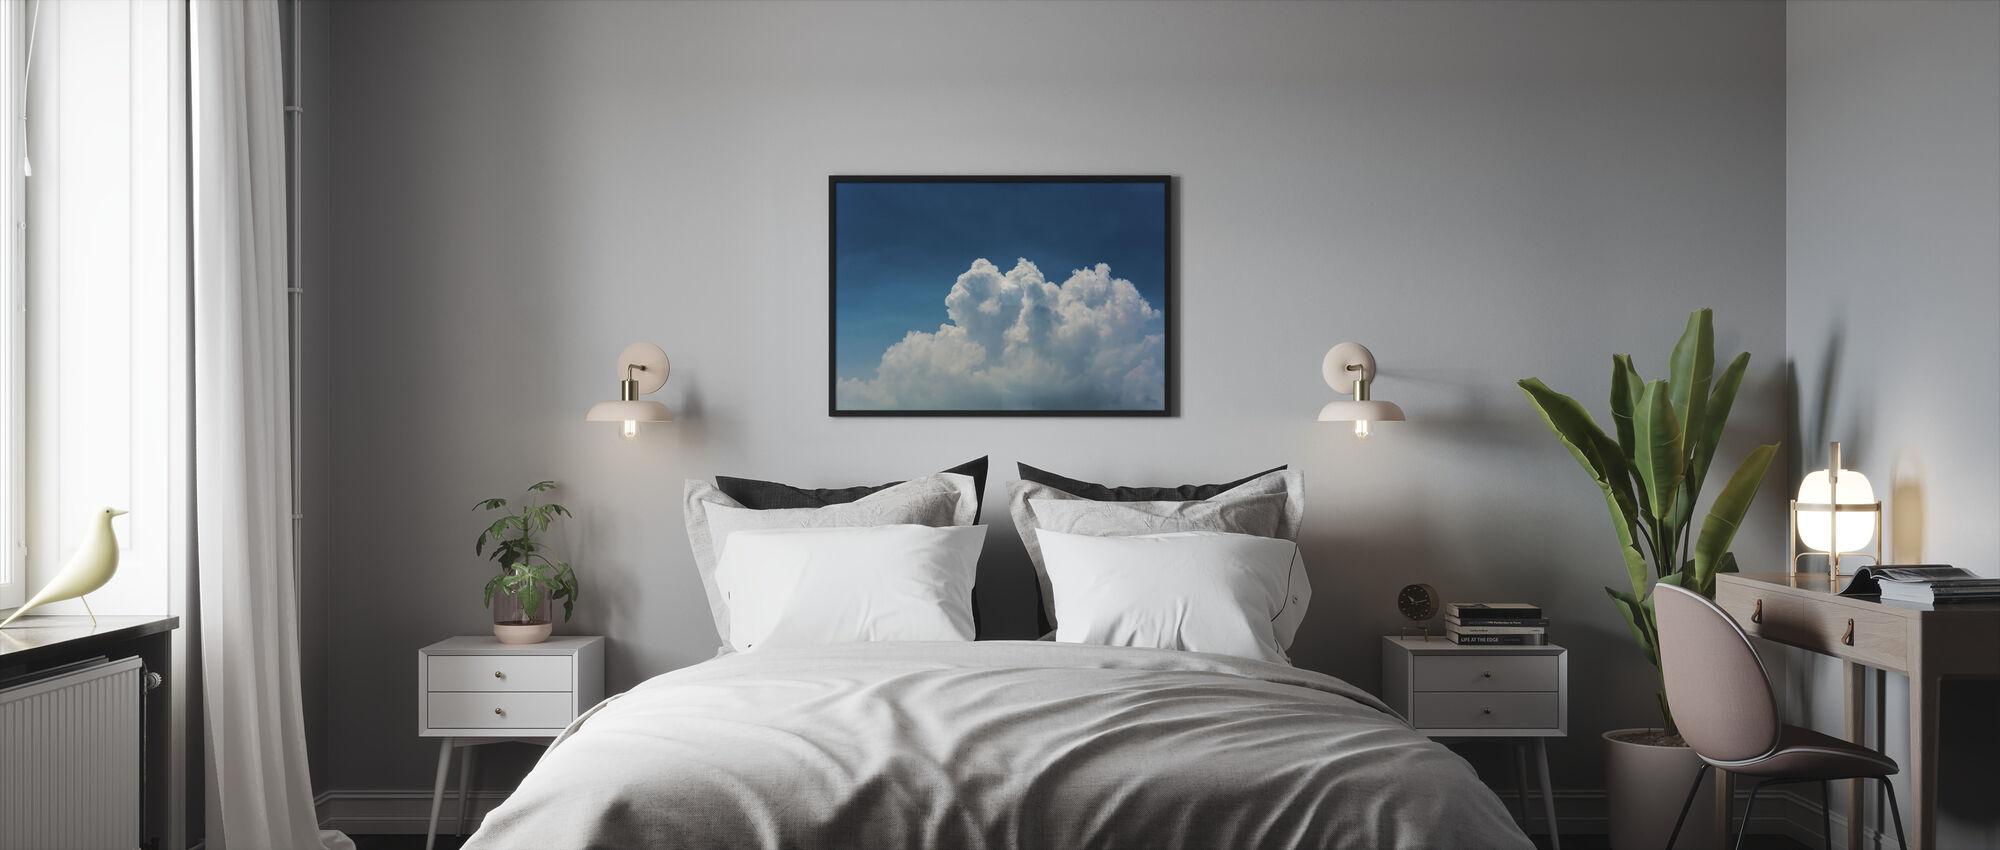 Blue Sky and Clouds - Framed print - Bedroom